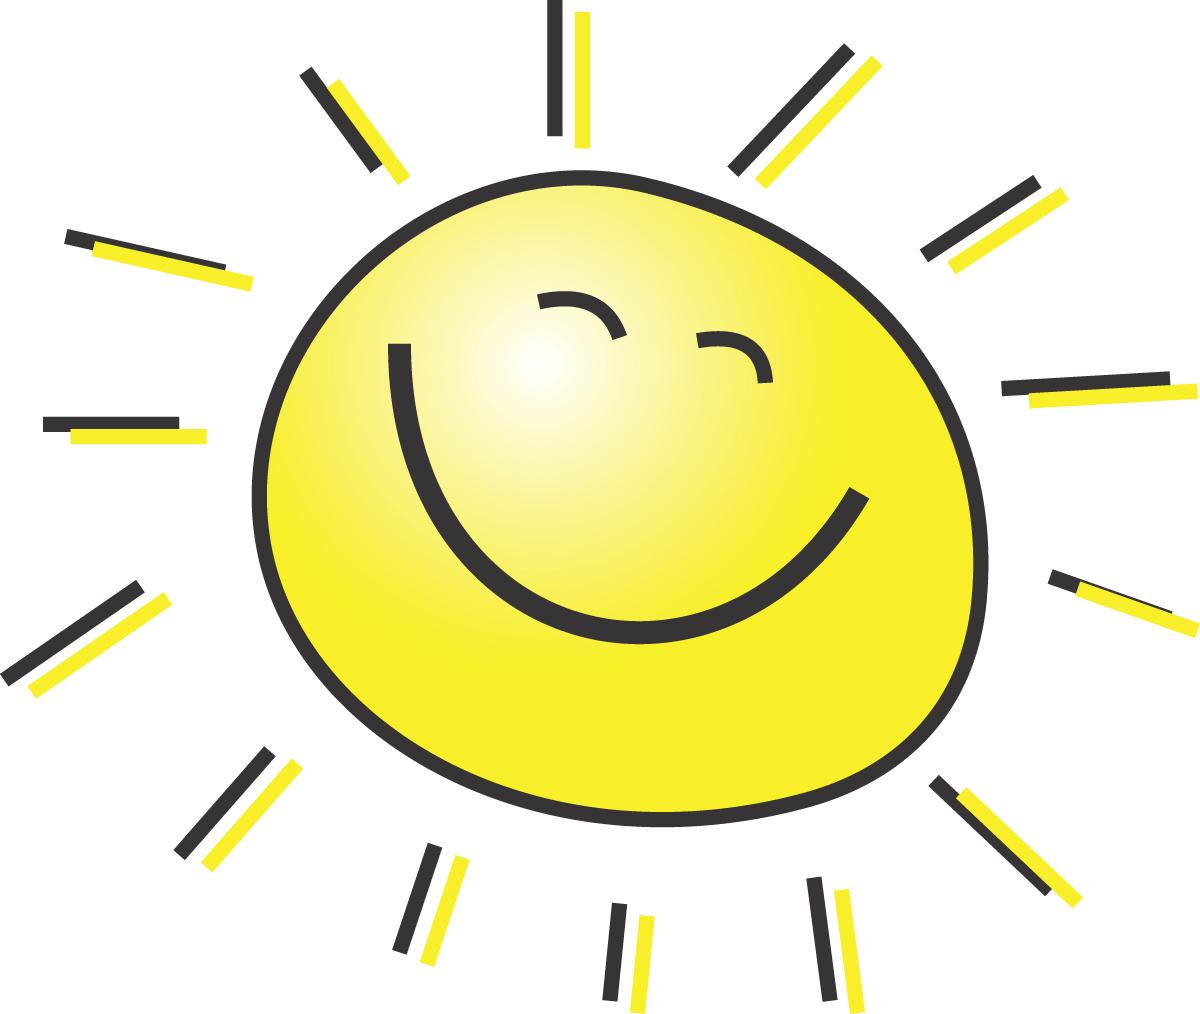 https://i1.wp.com/free.clipartof.com/5-Free-Summer-Clipart-Illustration-Of-A-Happy-Smiling-Sun.jpg